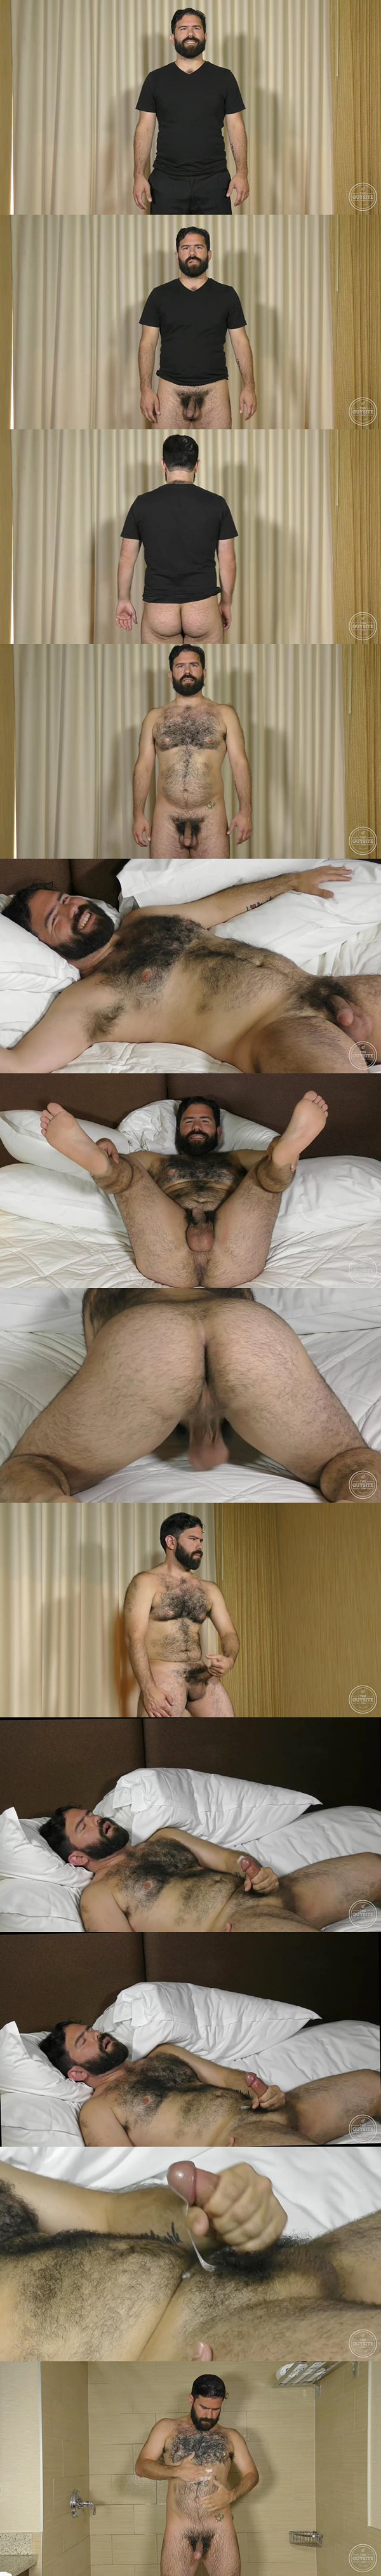 Hot fuzzy stud Daniel enjoys an extra long orgasm at Theguysite